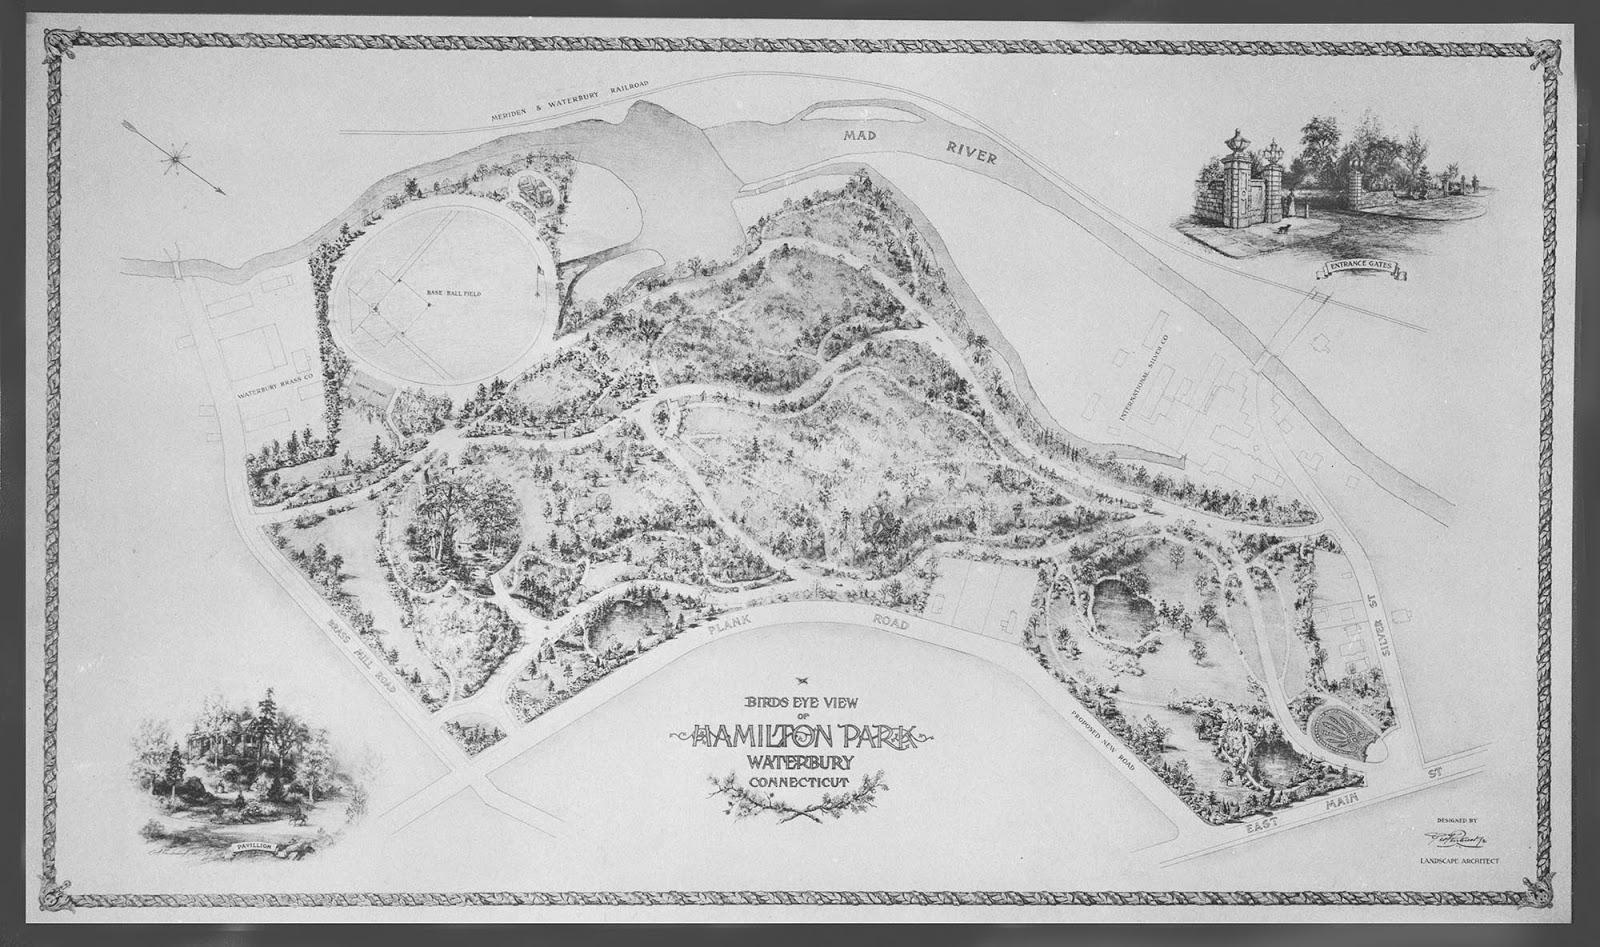 the original landscape plan for hamilton park copy in the collection of the mattatuck museum